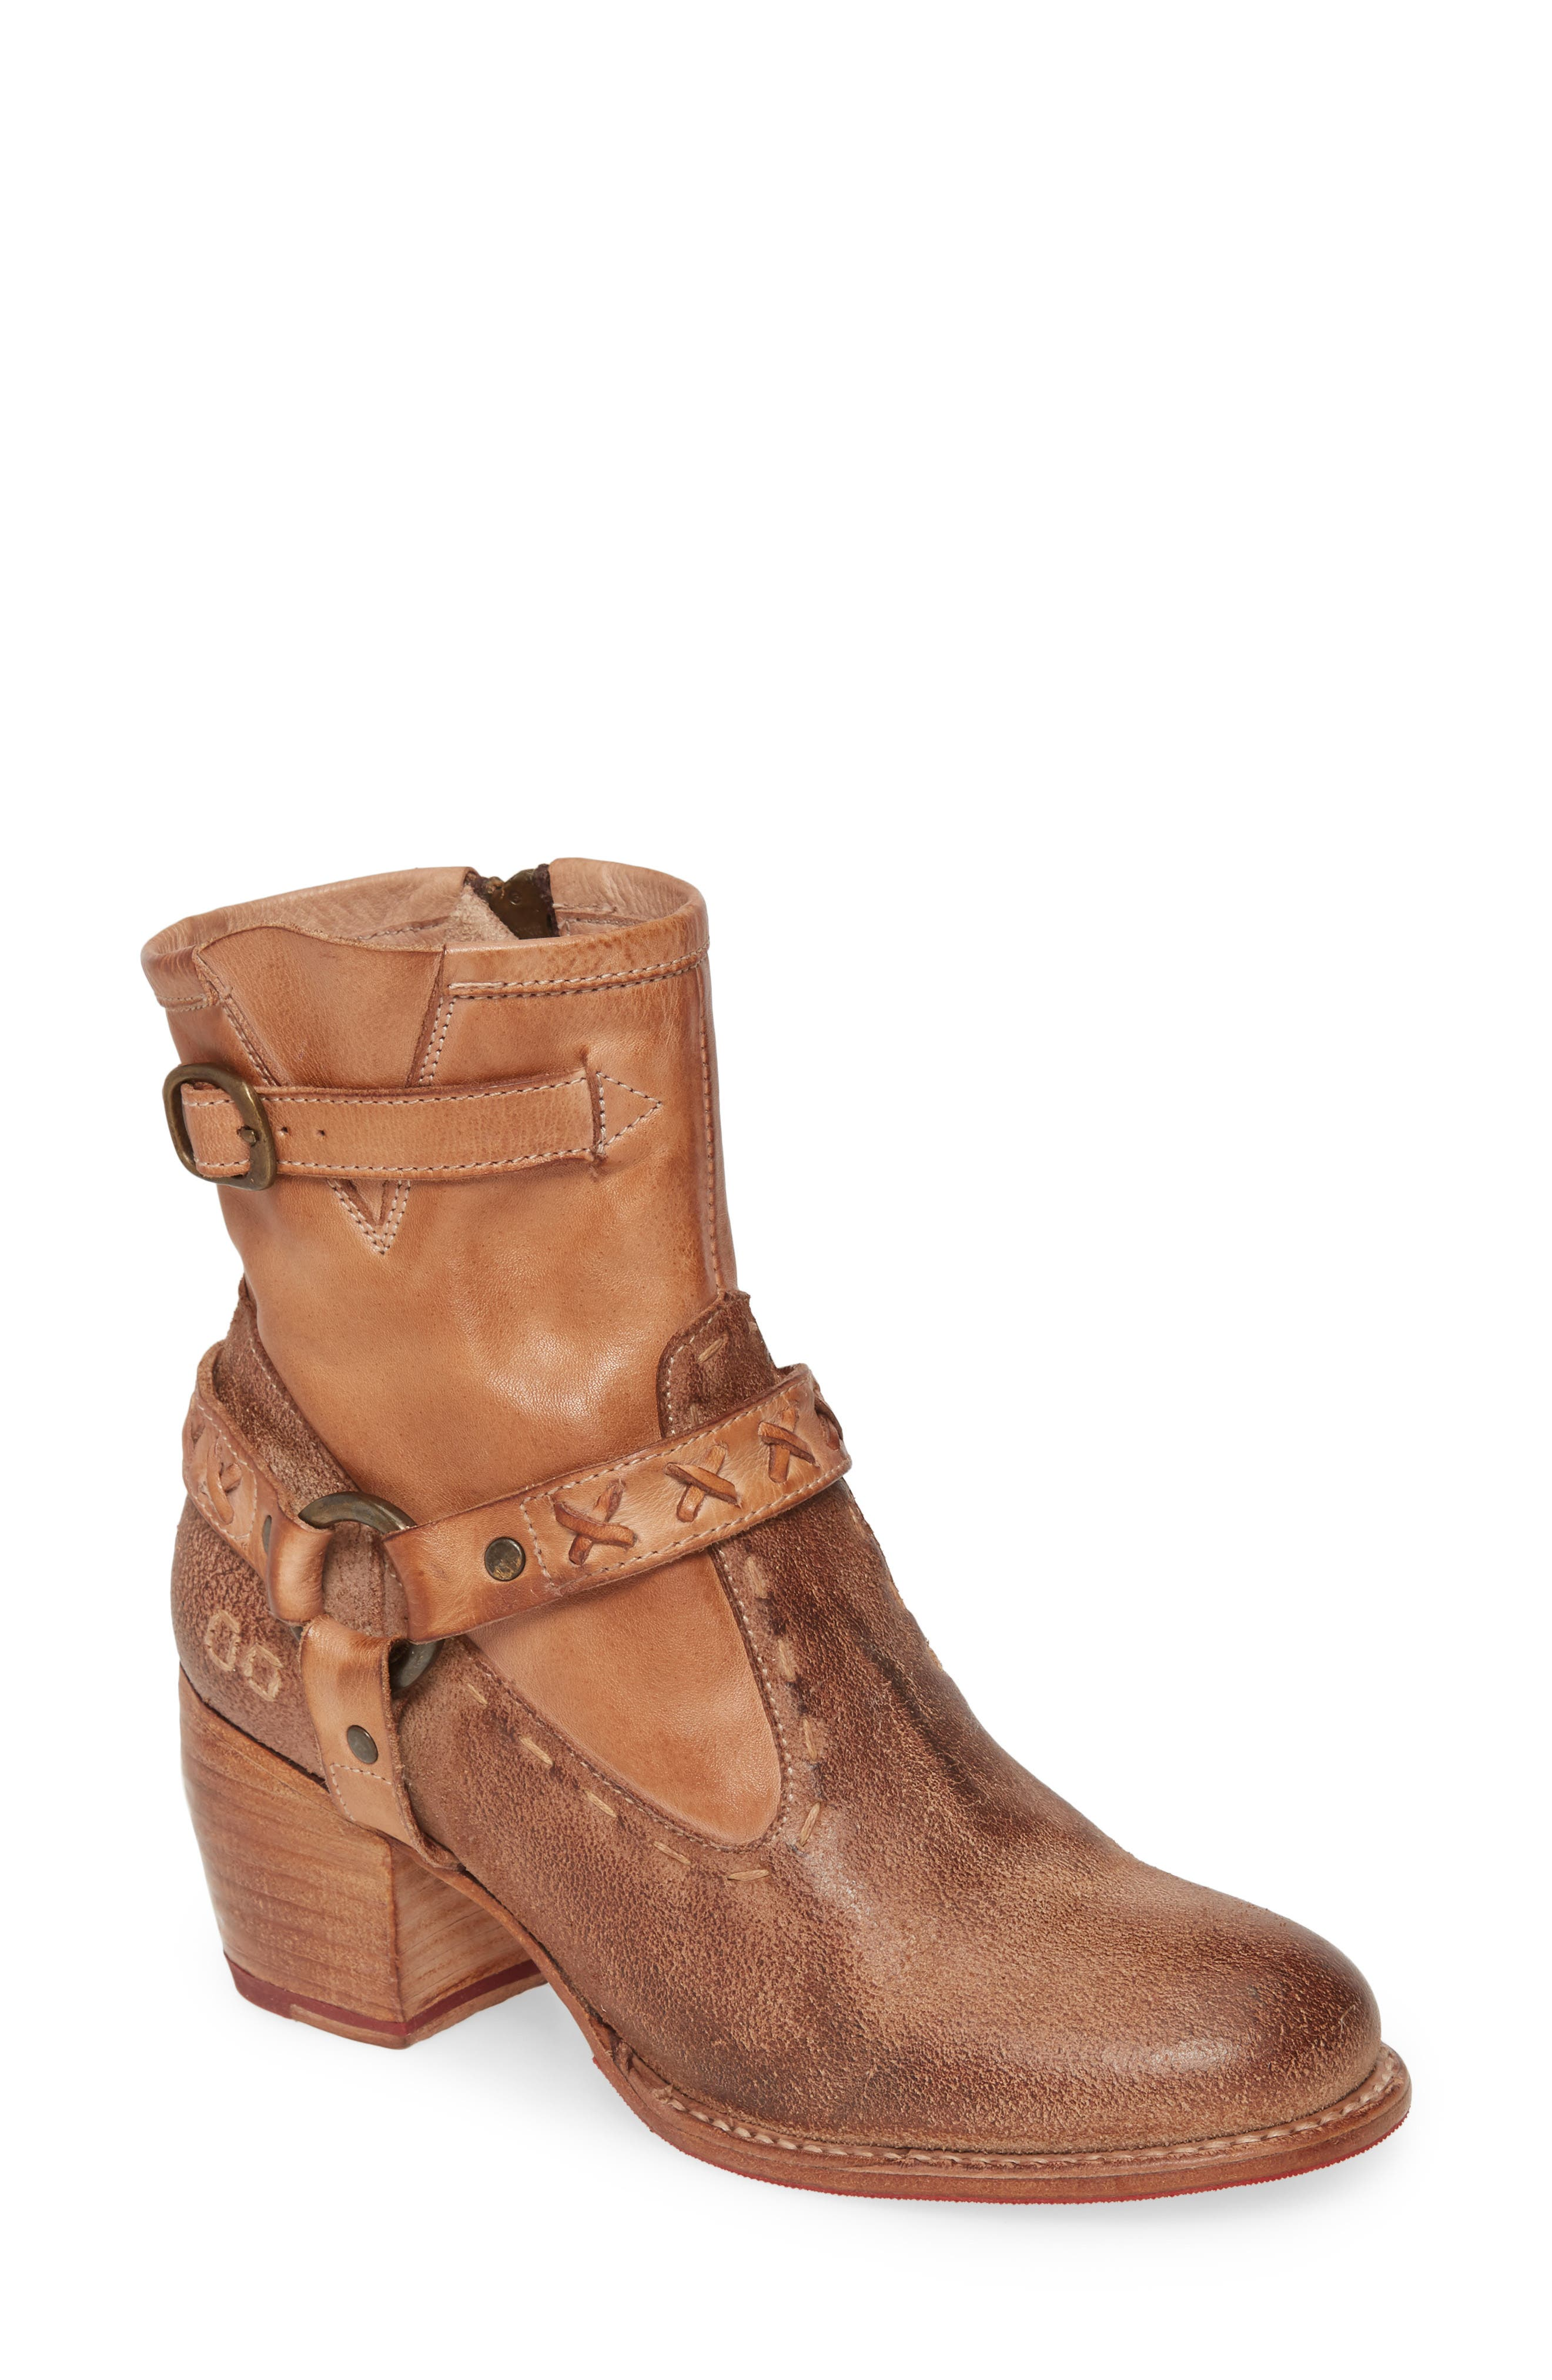 Octane 2 Western Boot